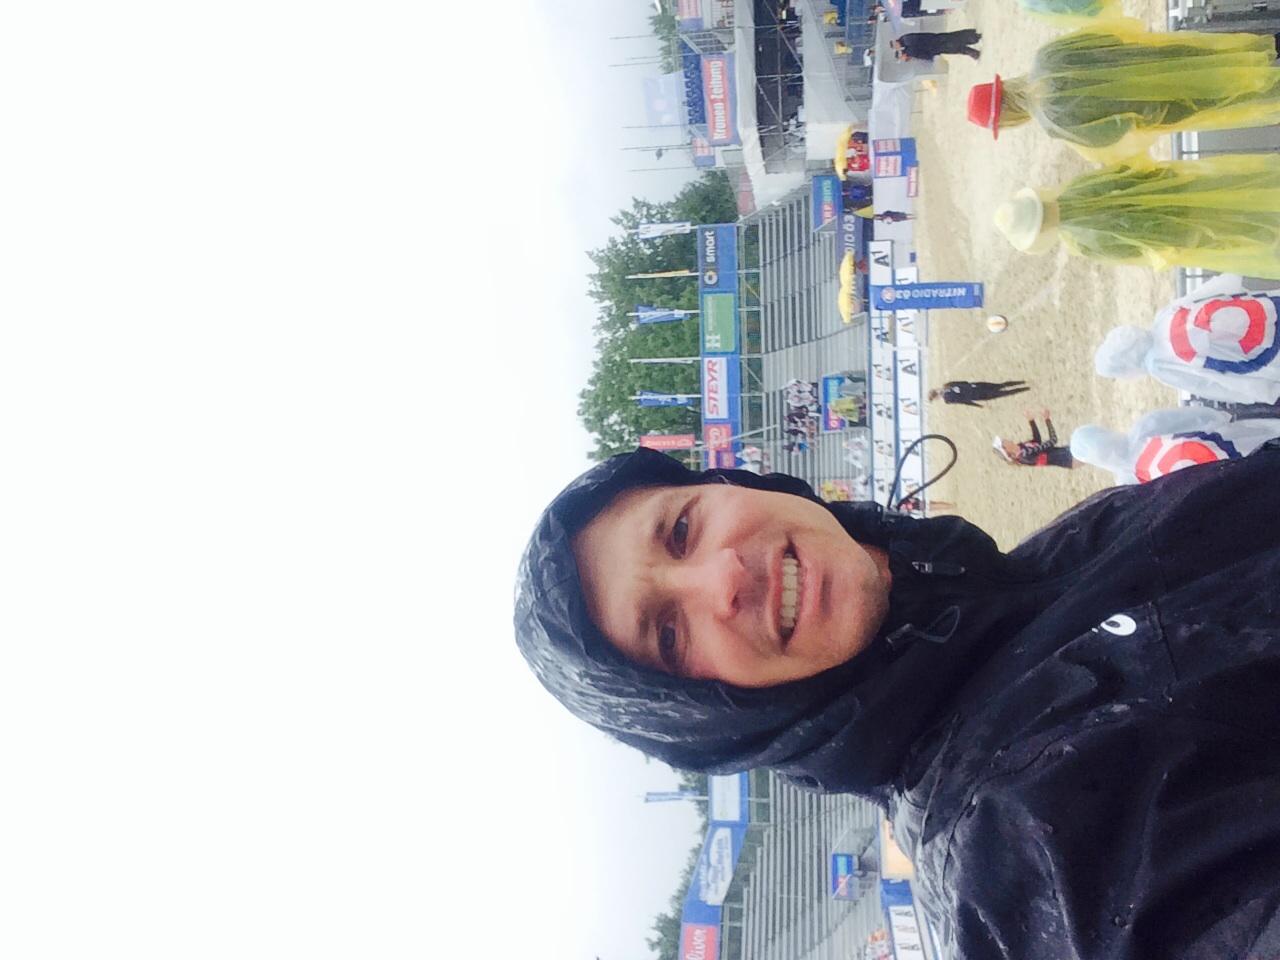 Thanks to ASICS storm shelter jacket I was dry!!!